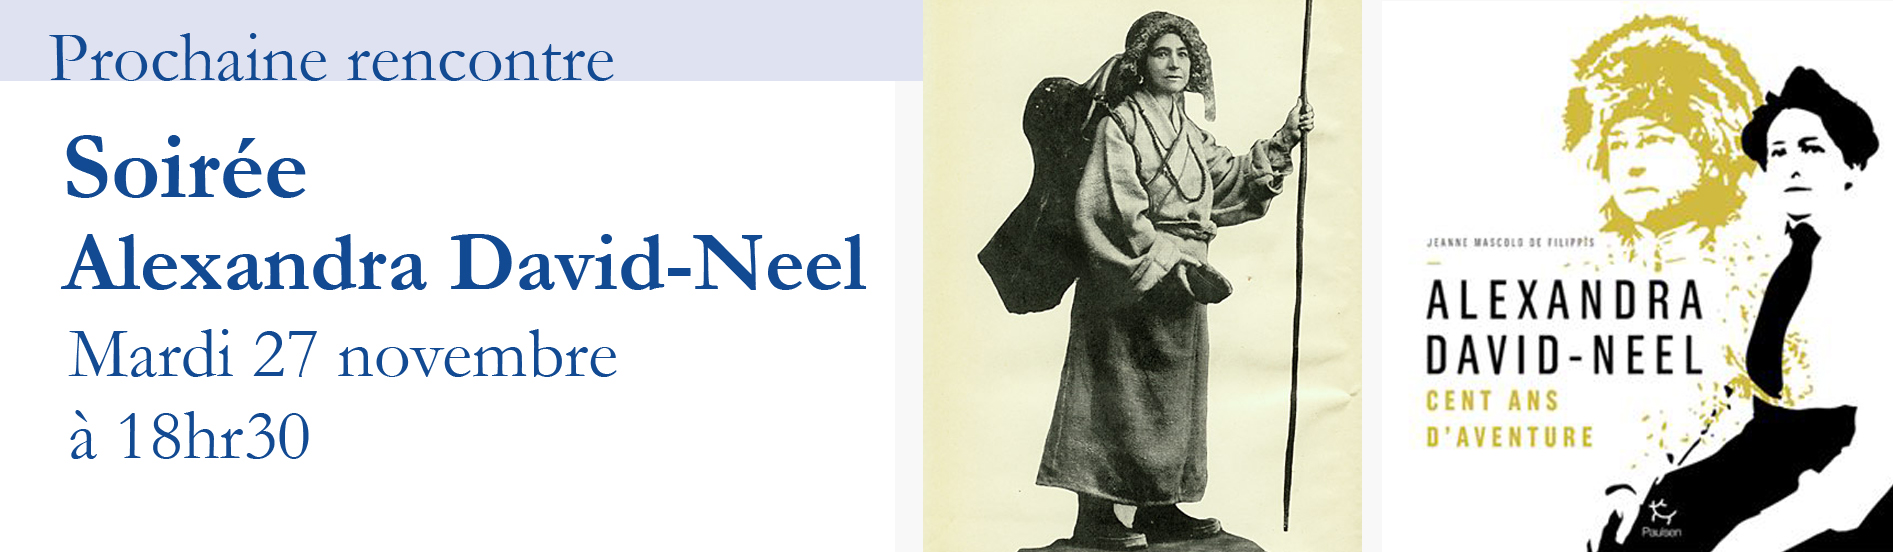 Soirée autour de Alexandra David-Neel